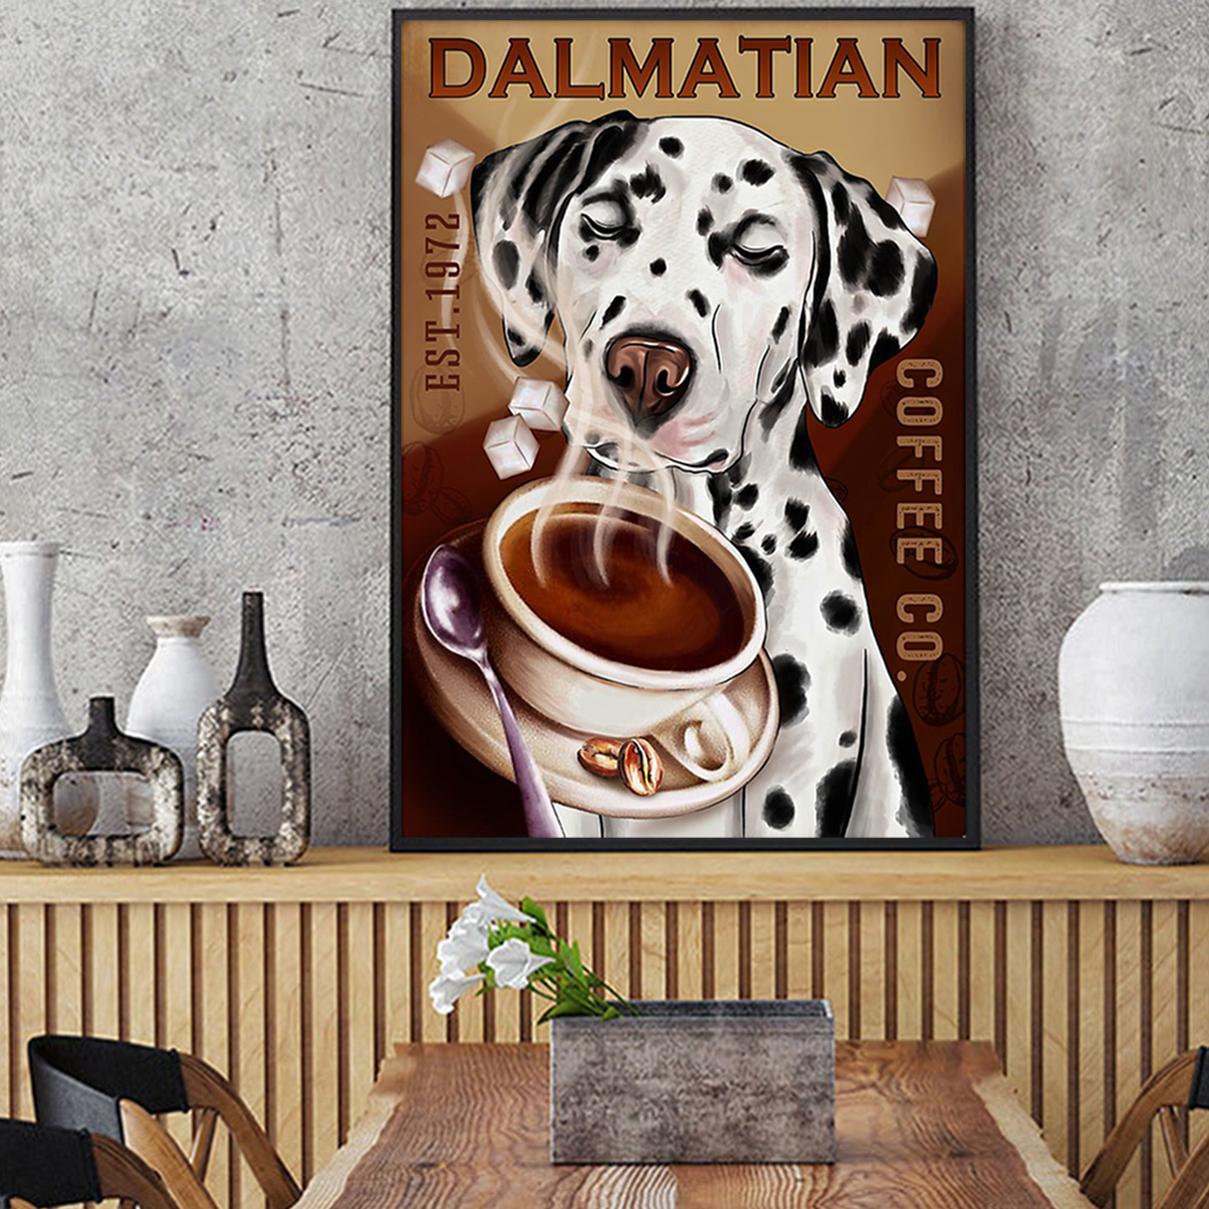 Dalmatian coffee poster A1